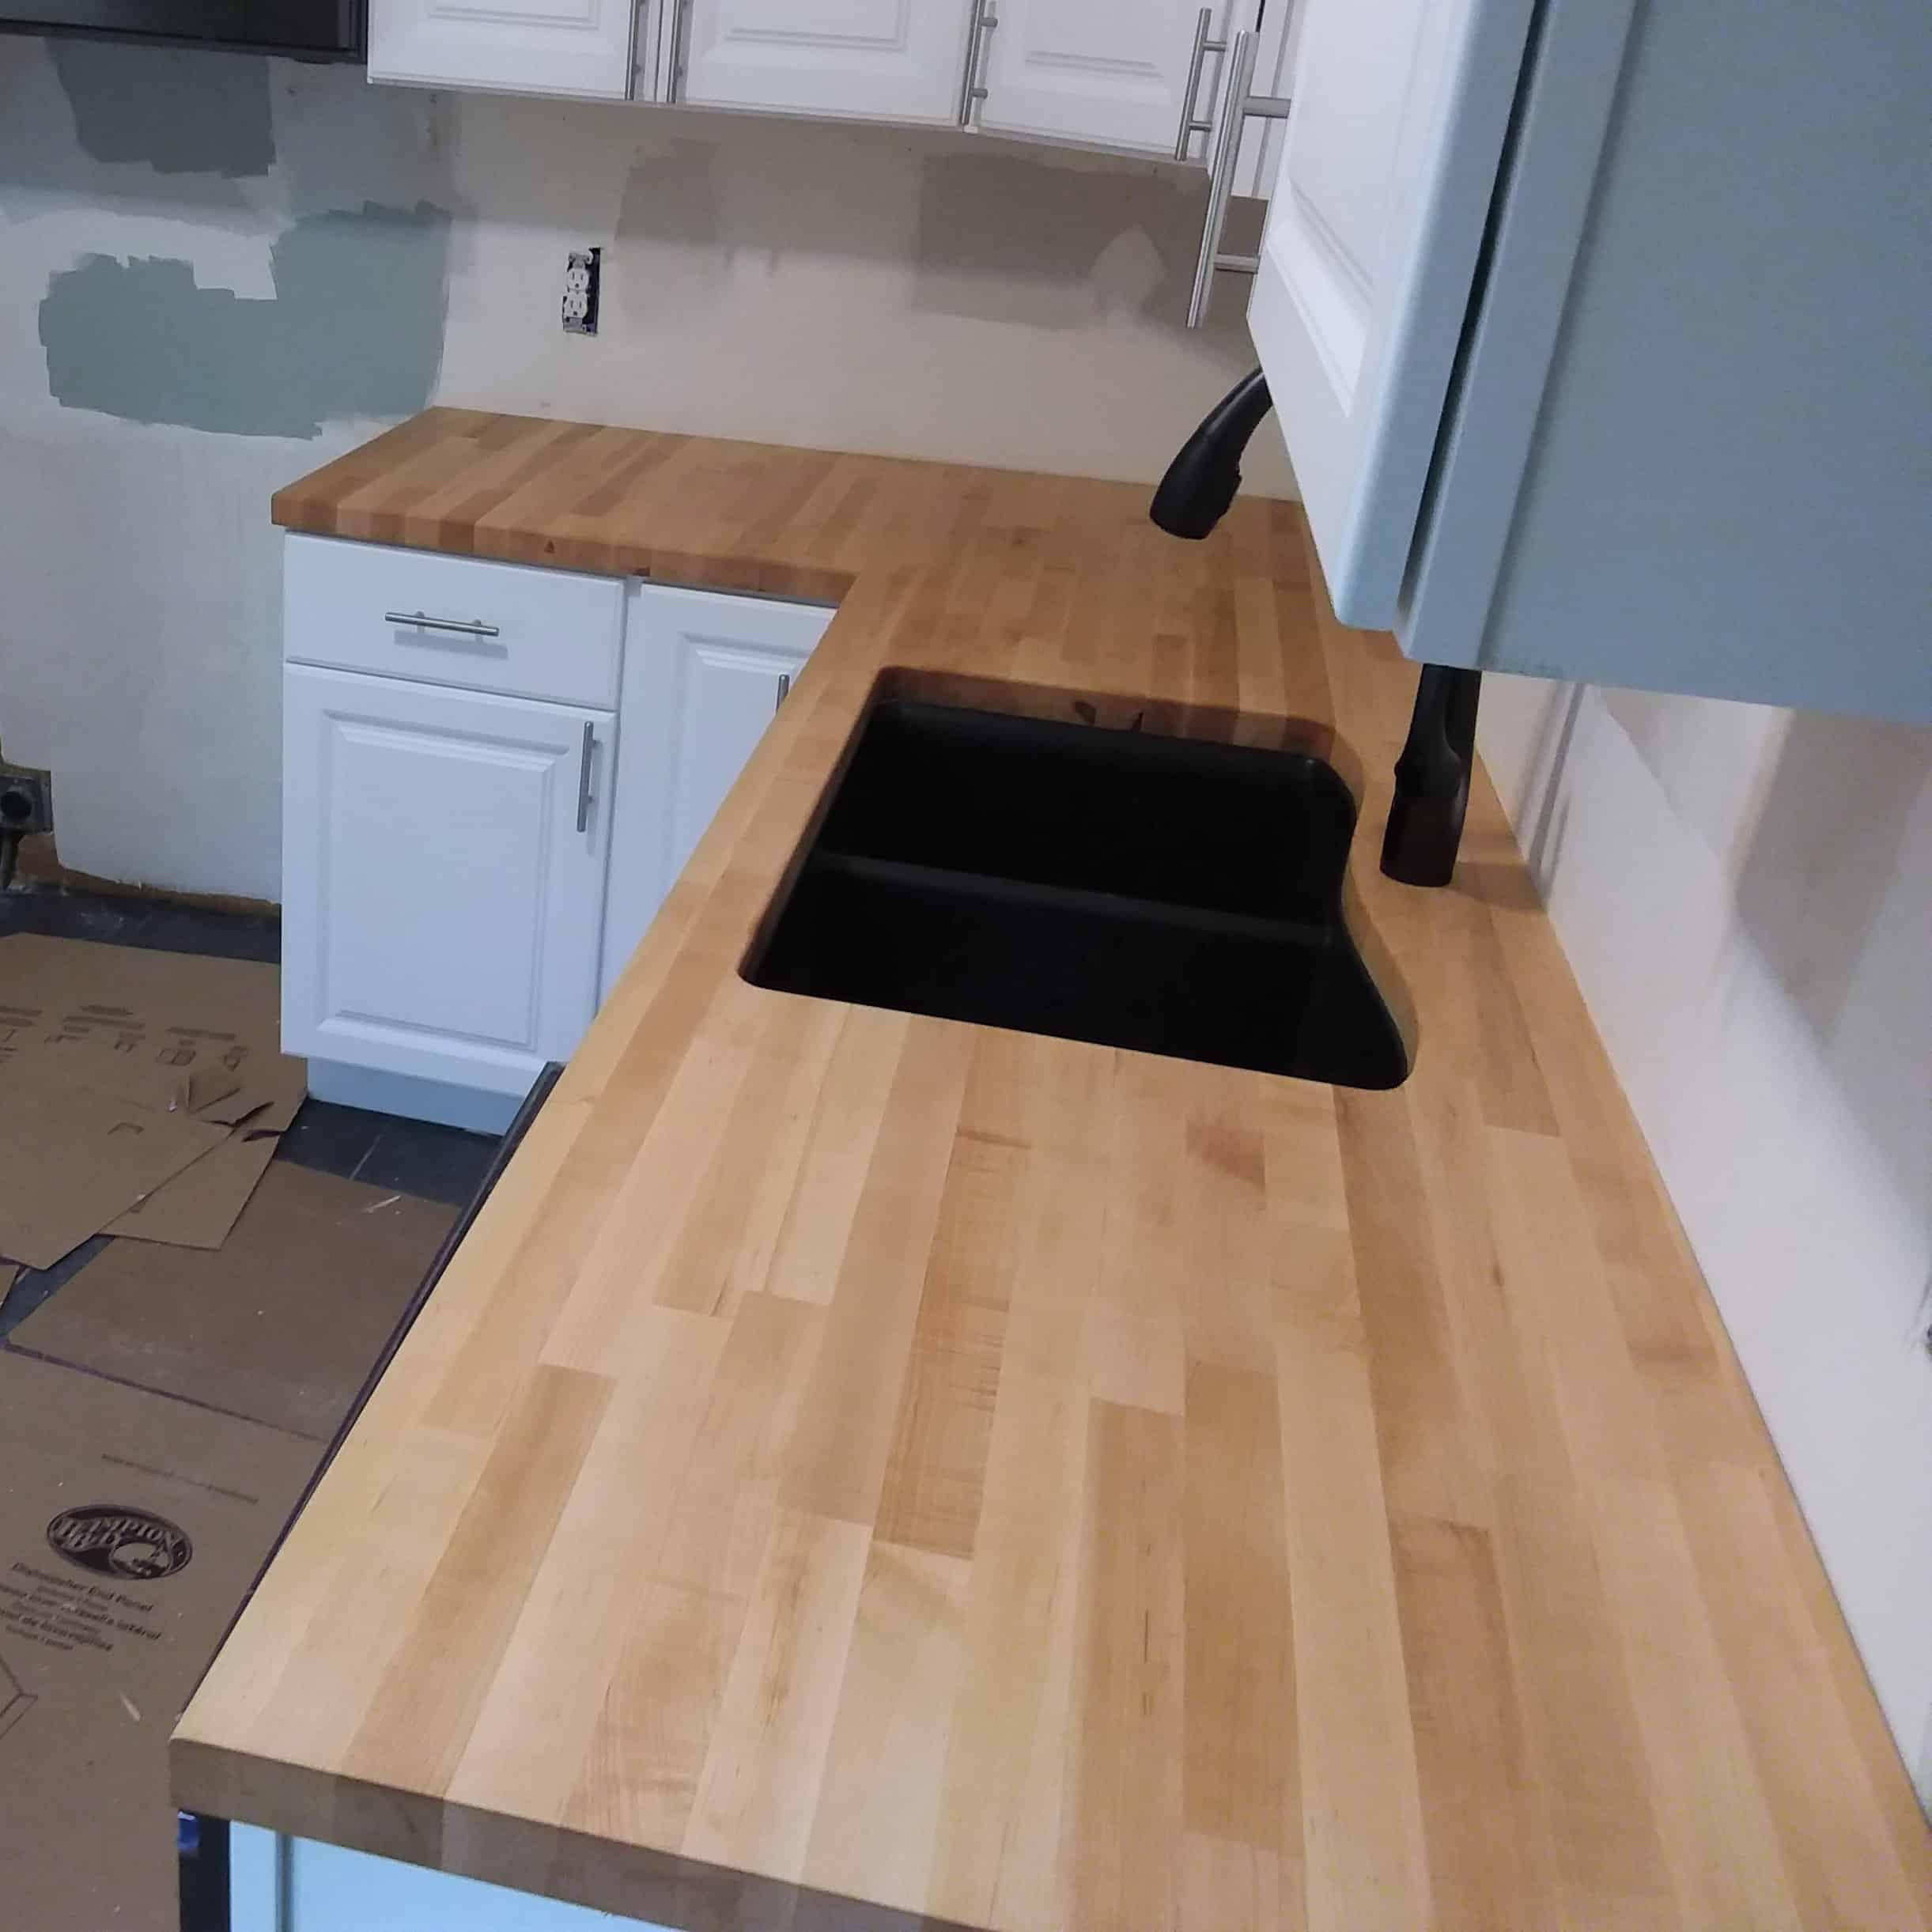 New England Wood Countertops - 15 years of custom ... on Maple Countertops id=55464